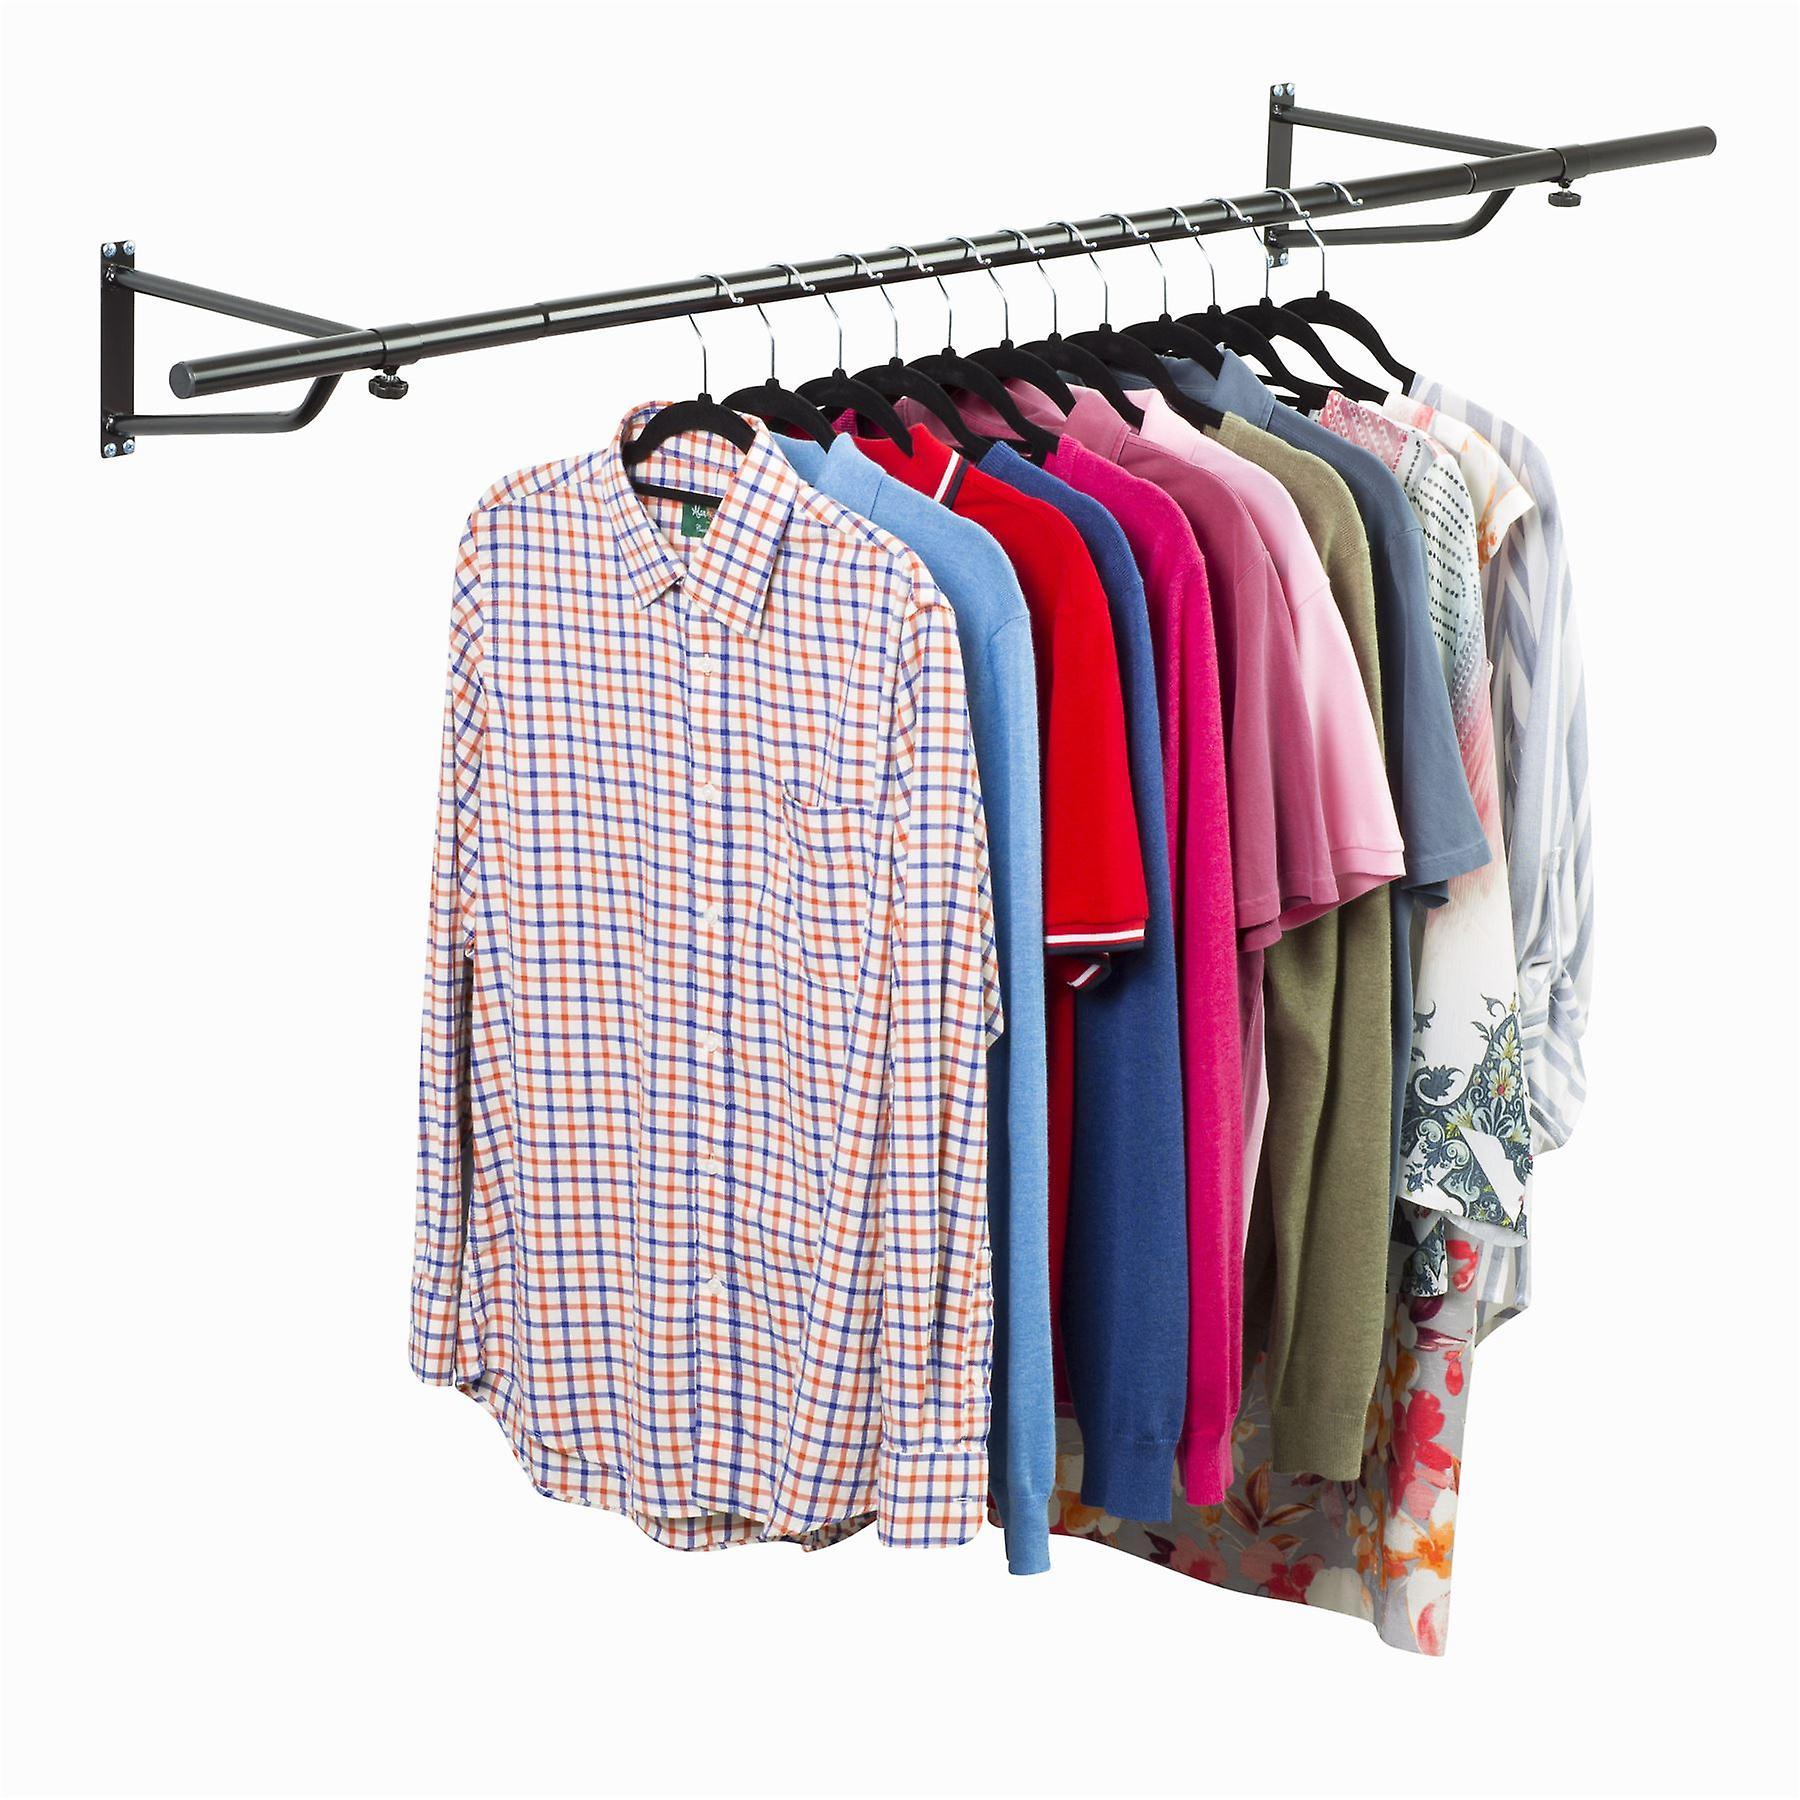 4ft Garment Rail In Black Powder Coating